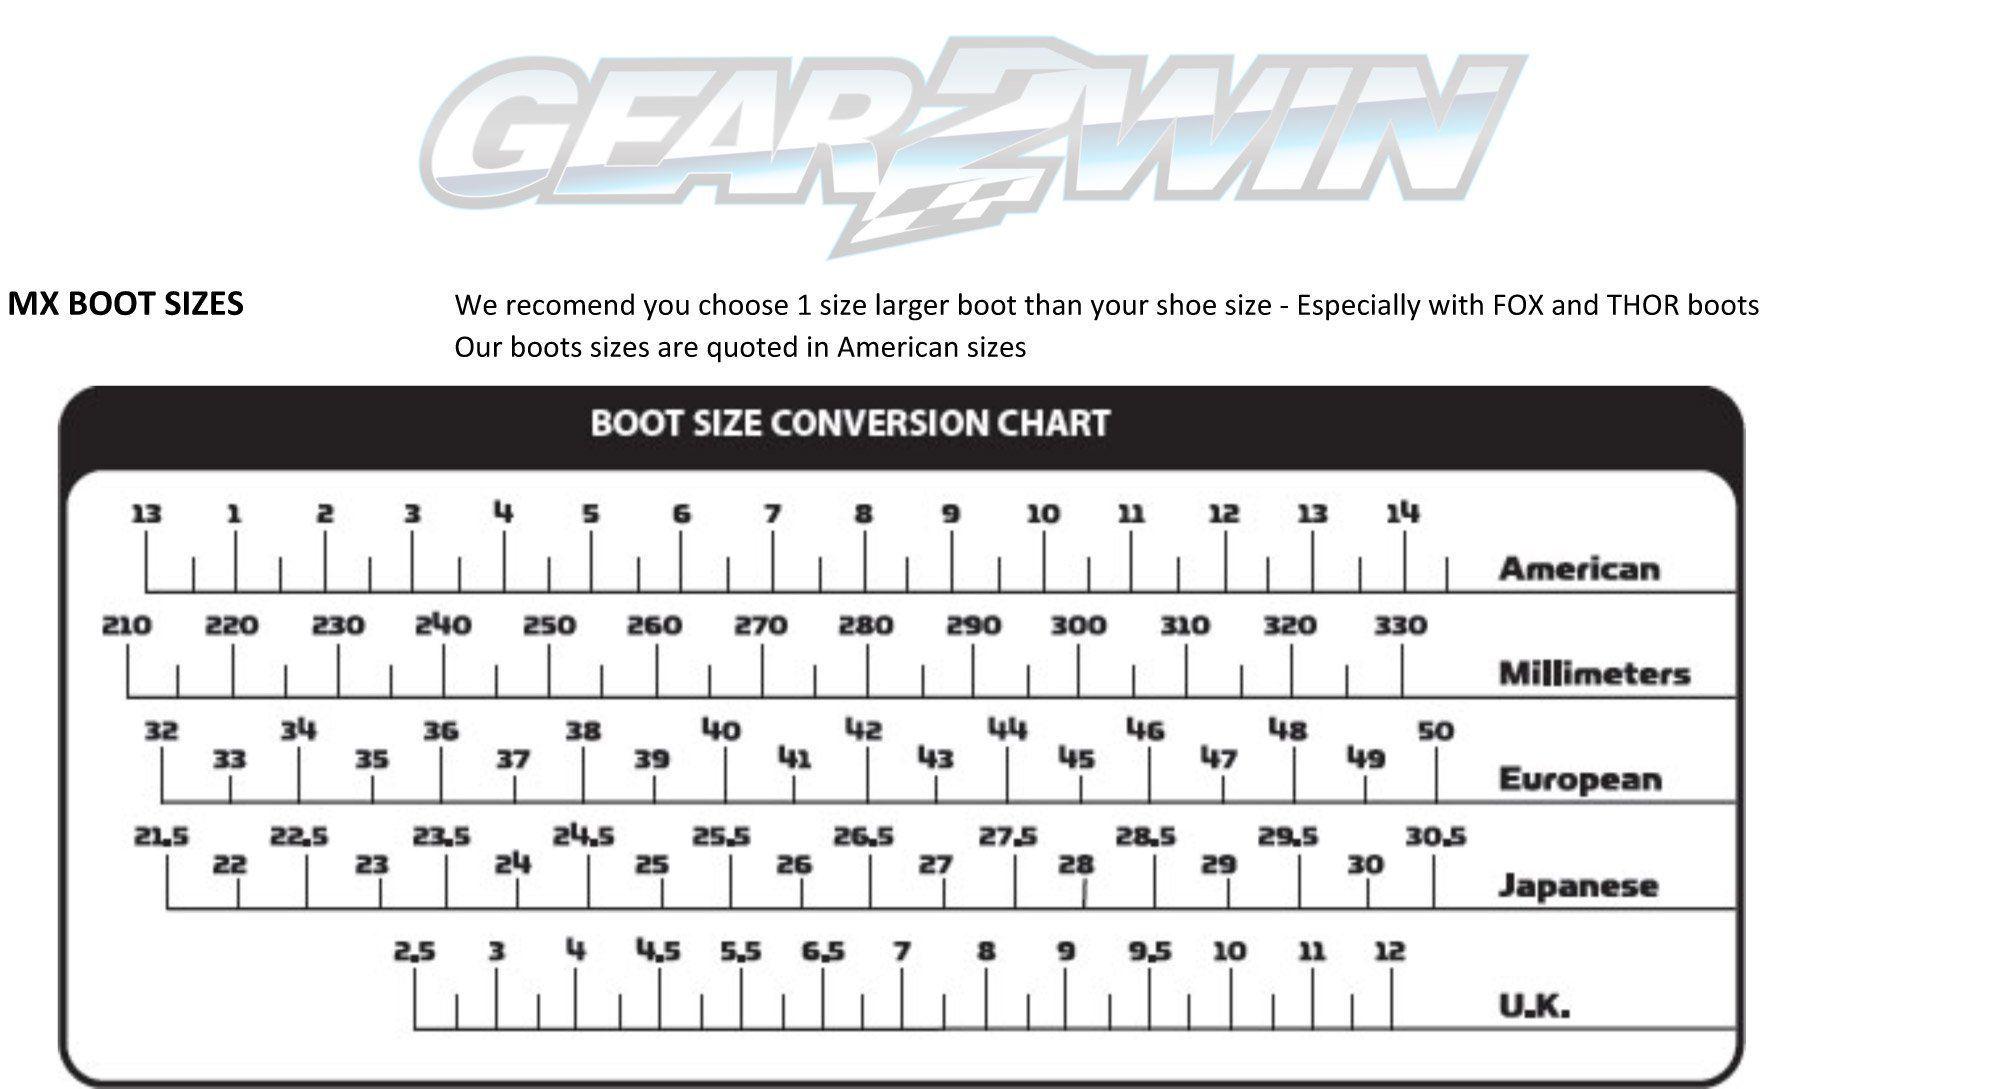 Gear2win MX Boot sizing chart